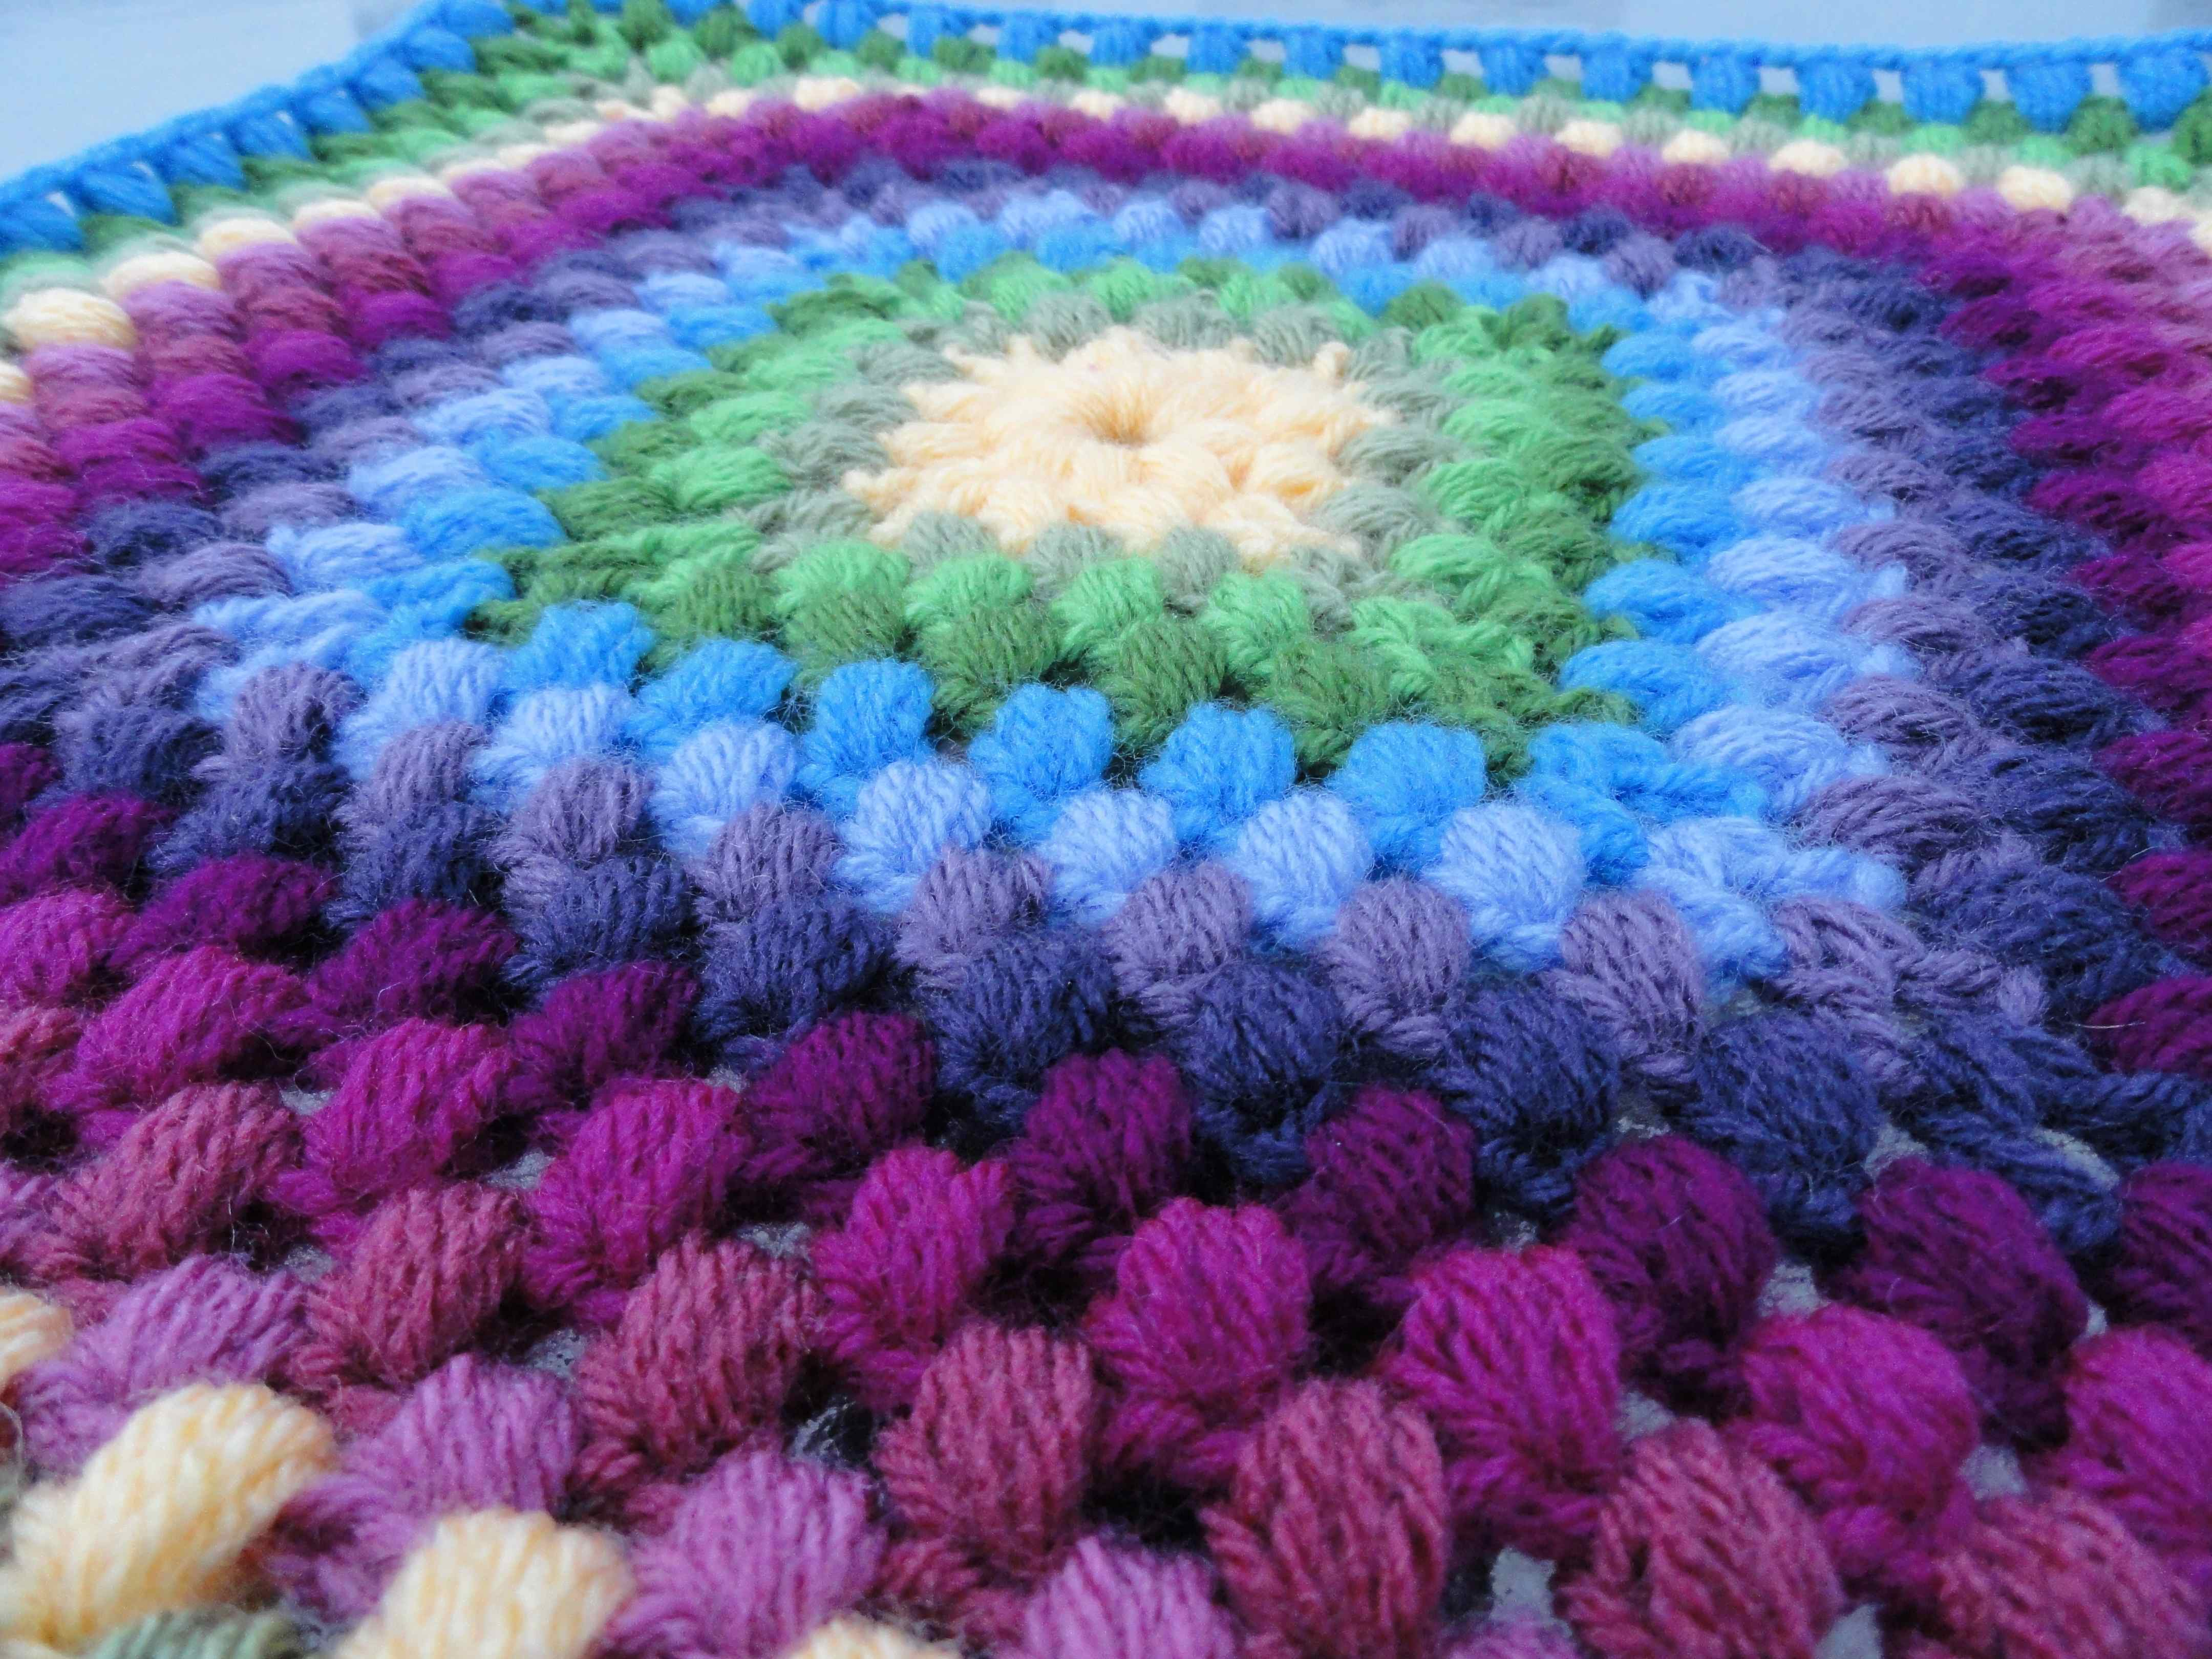 Crochet Stitches Squares : crochet:: hawaiian granny square pattern yarnchick40